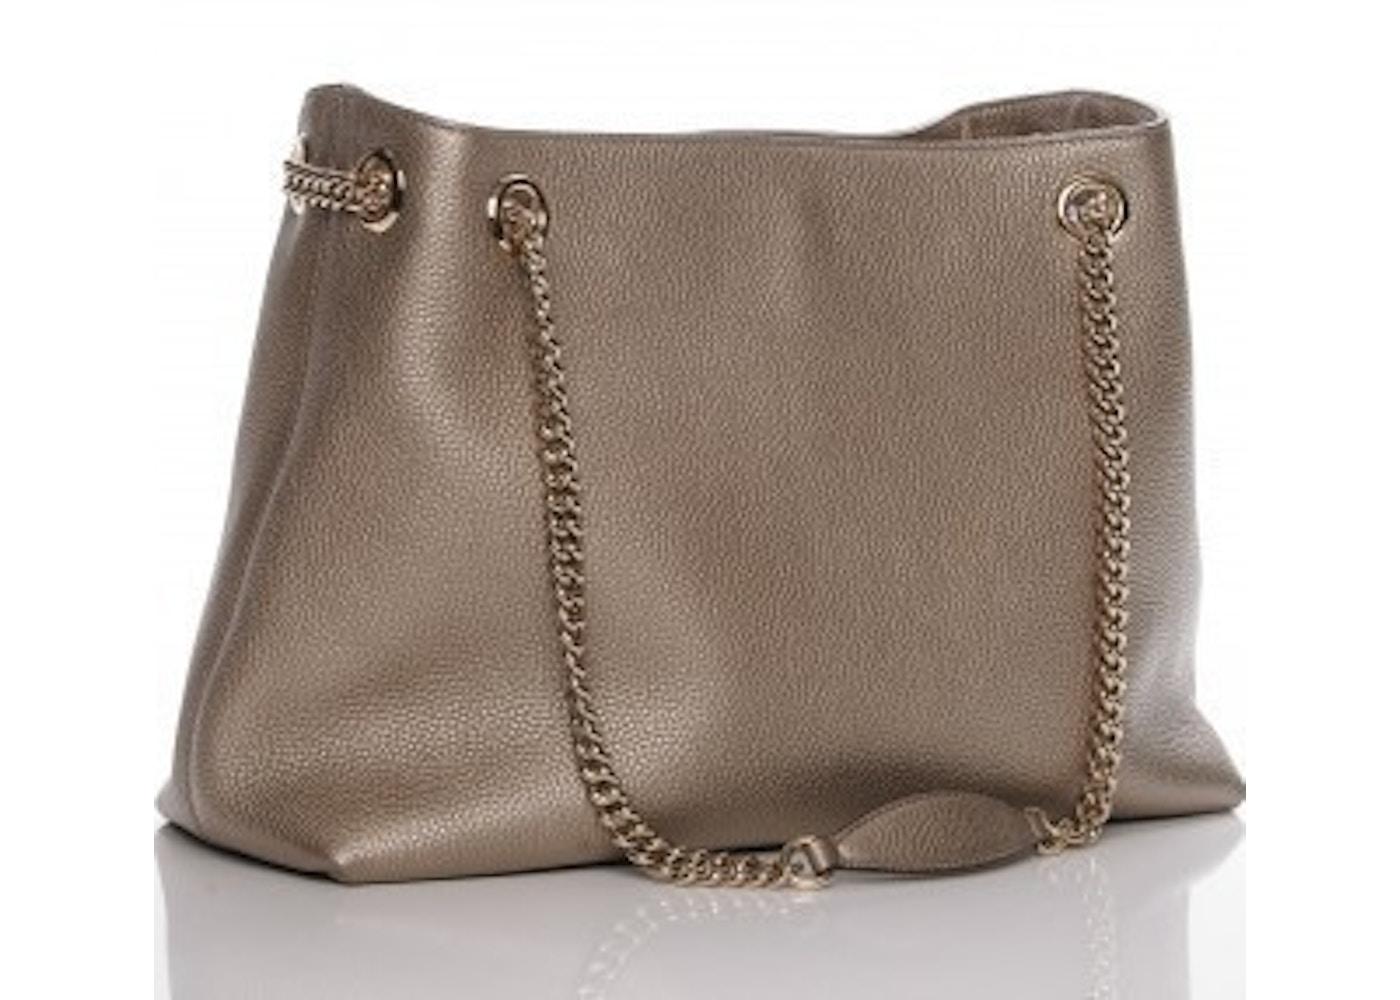 15938d709258 Gucci Soho Shoulder GG Interlocking Tassel Medium Metallic Golden Beige